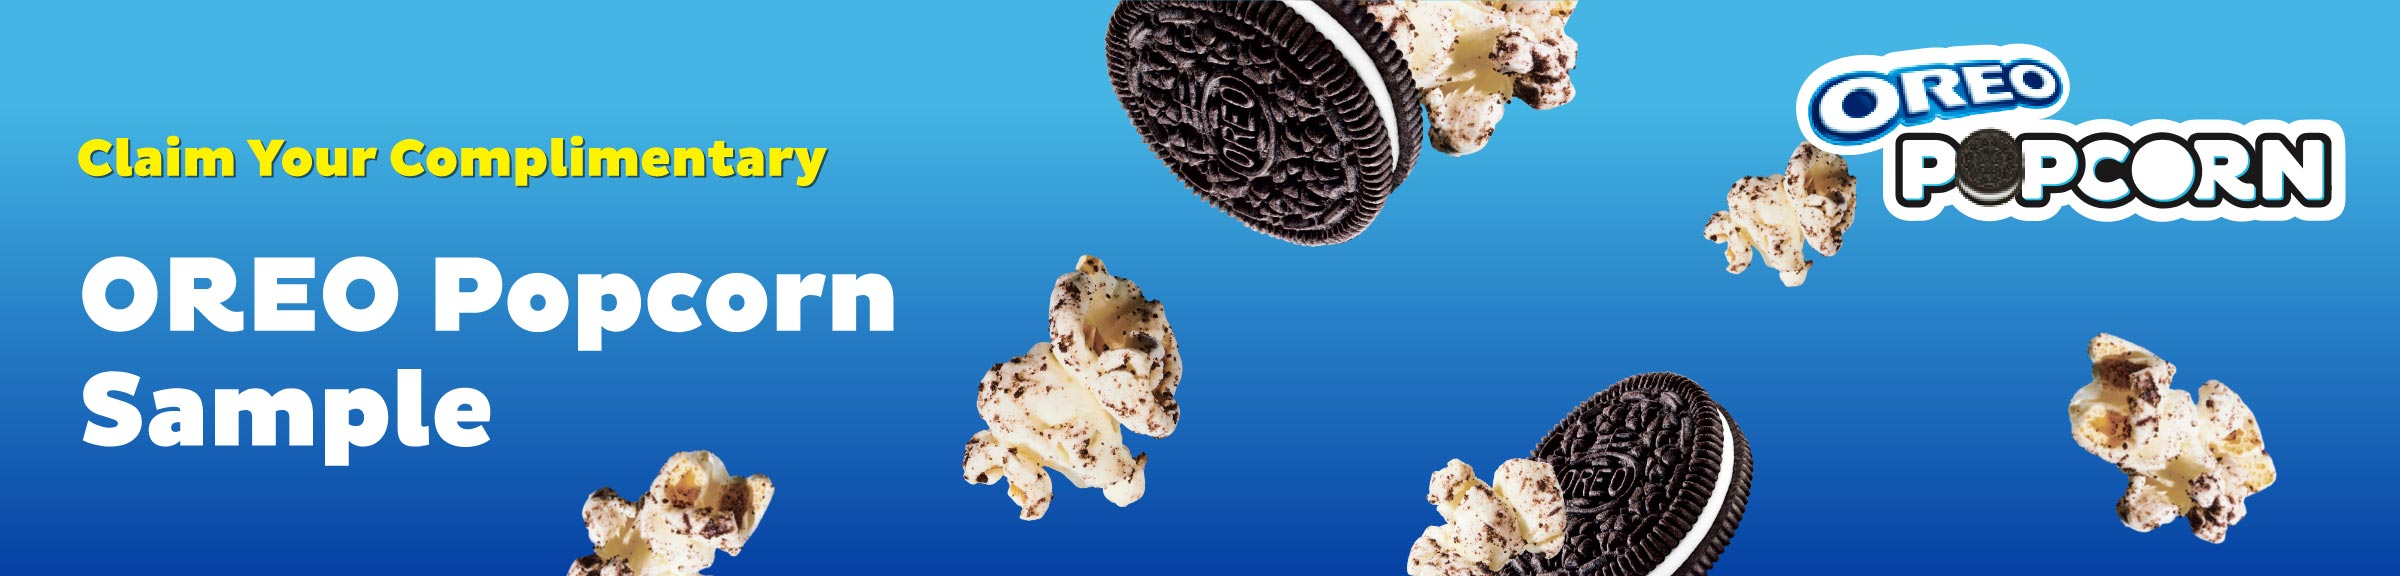 Claim your complimentary OREO Popcorn Sample